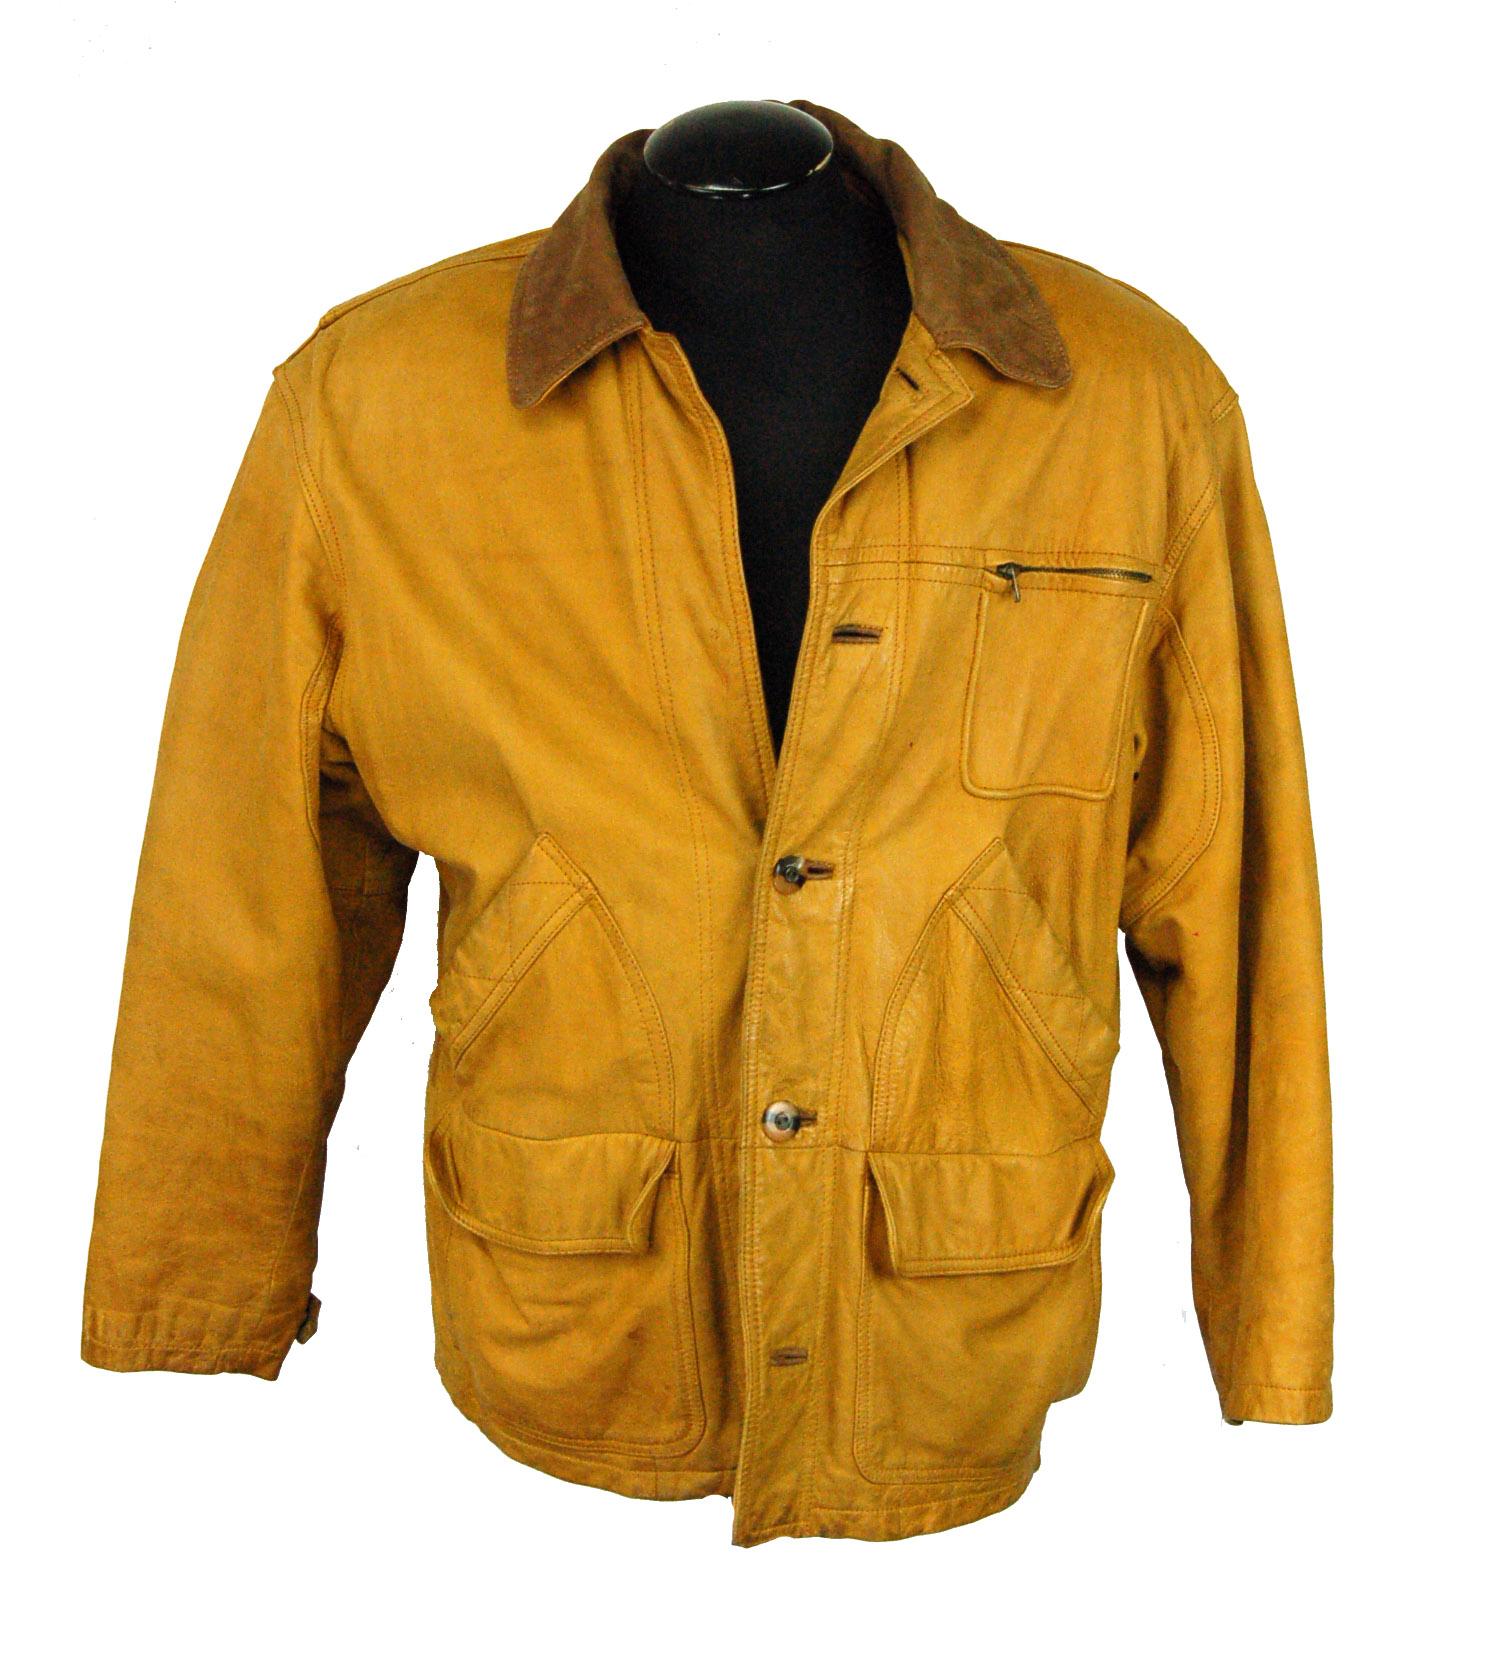 7aafab3cc Vintage Winlit Leather Men's Jacket - Size Medium   Property Room